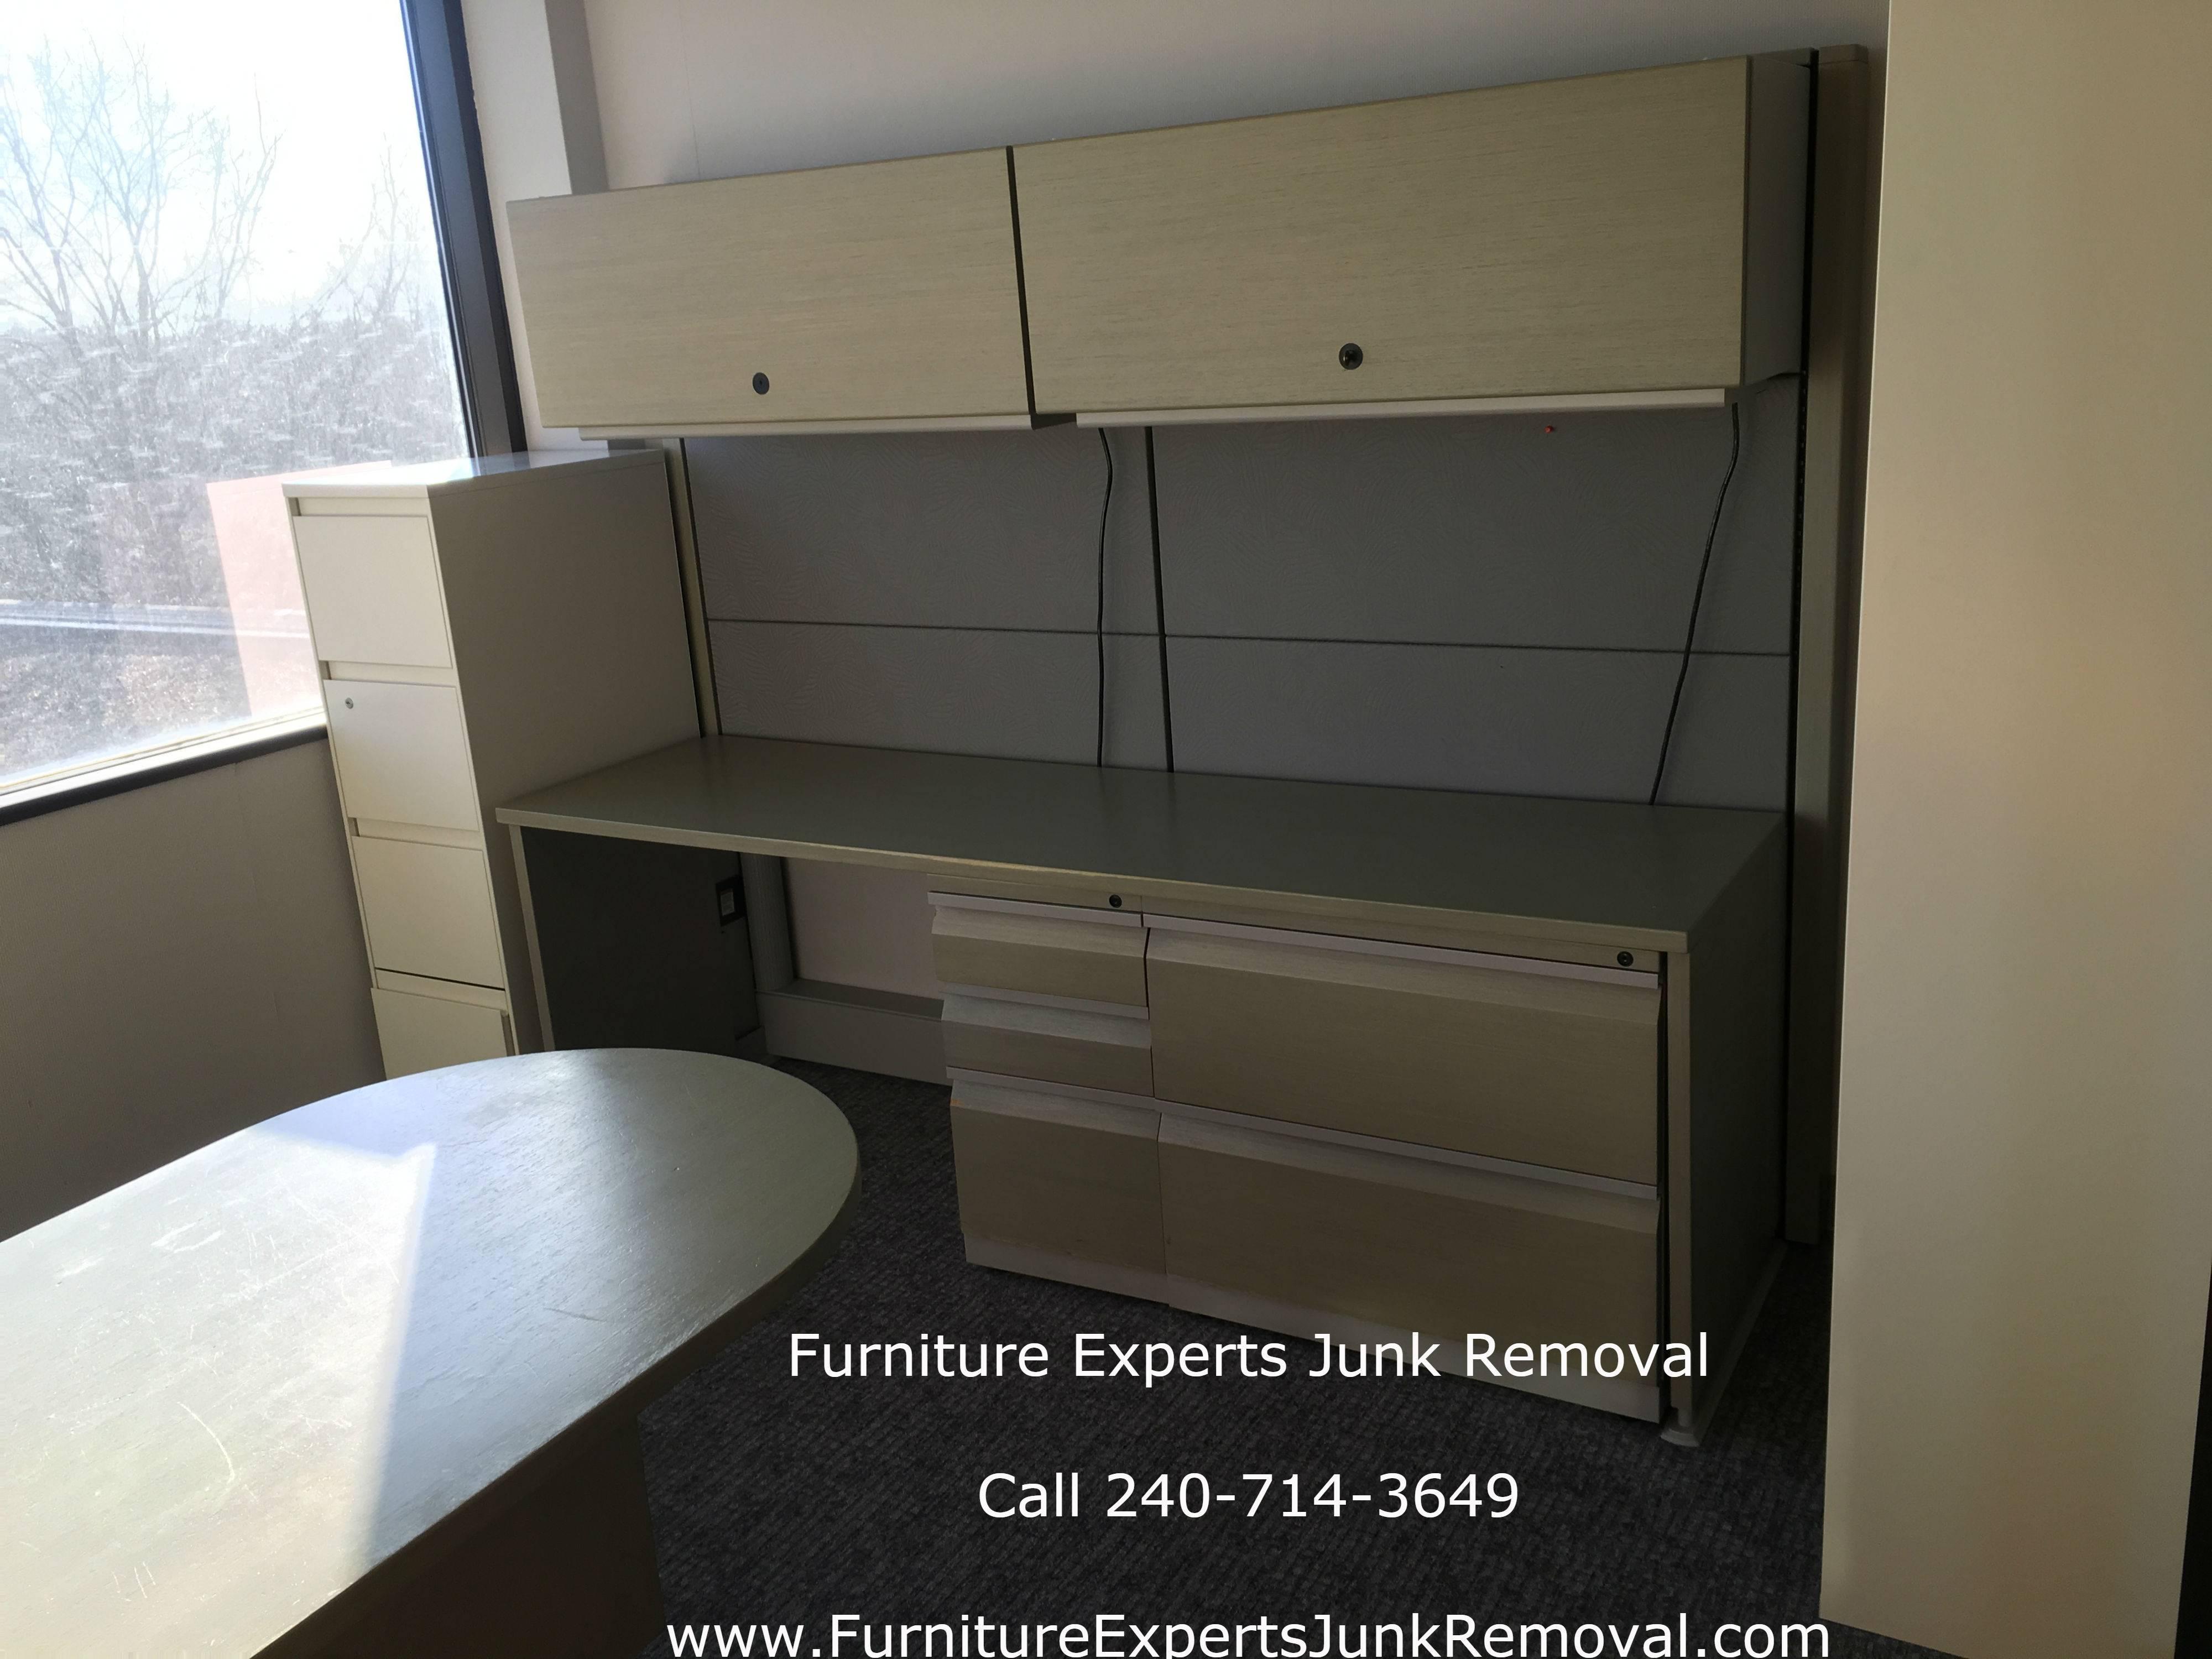 Junk office furniture removal in leesburg VA